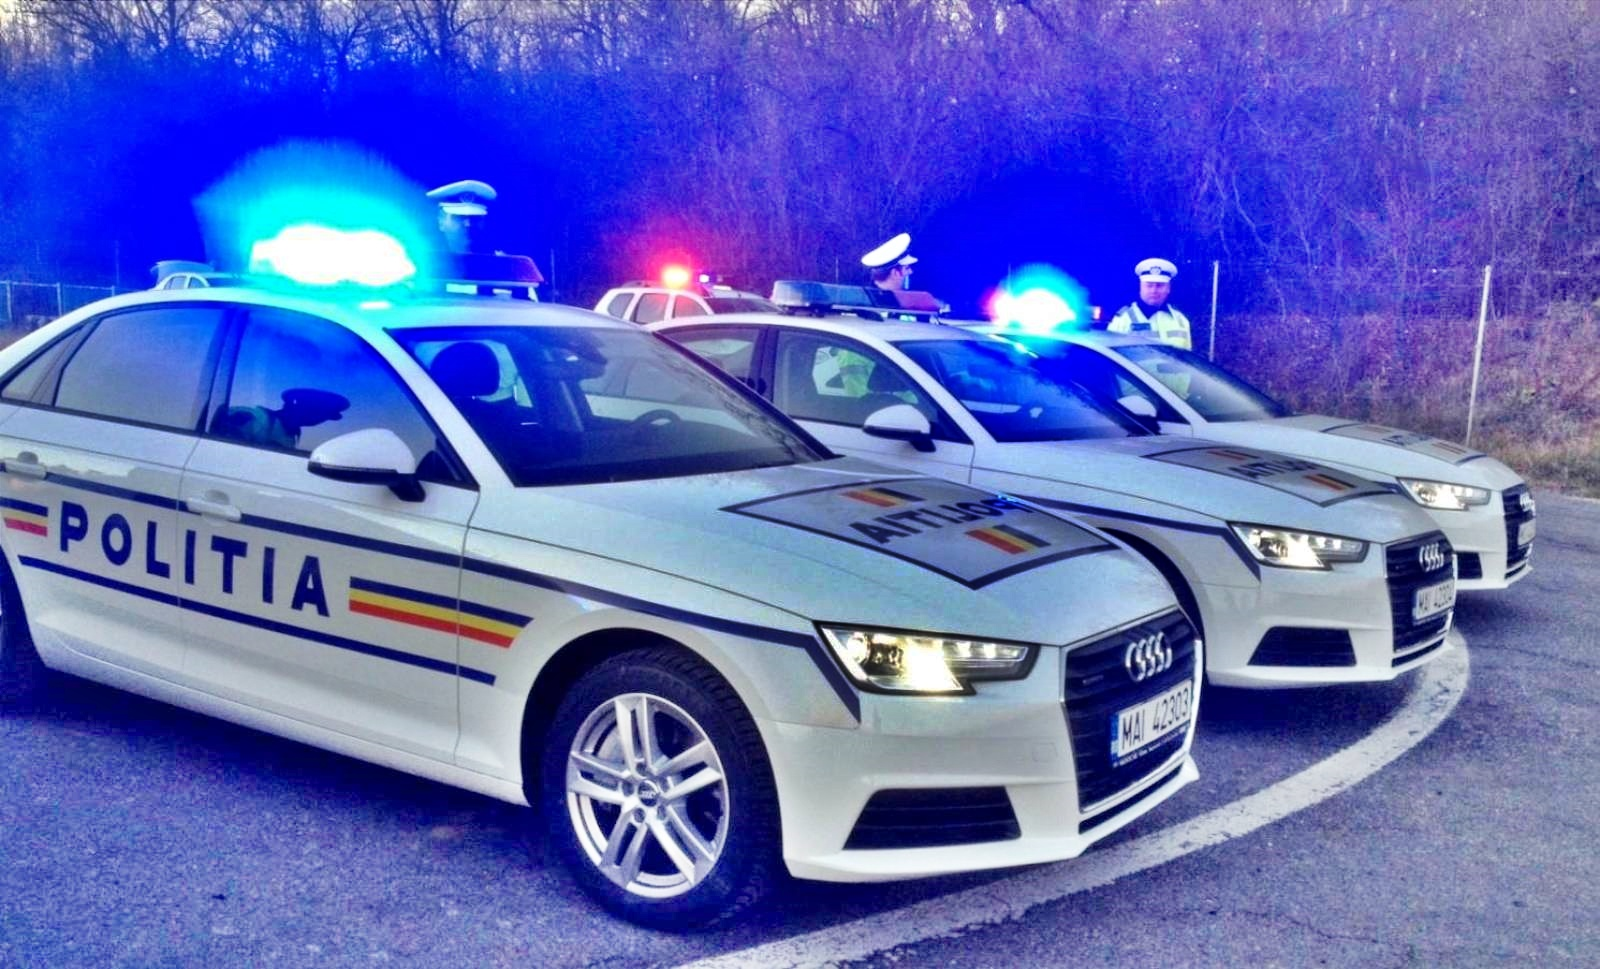 Politia Romana metadona volan